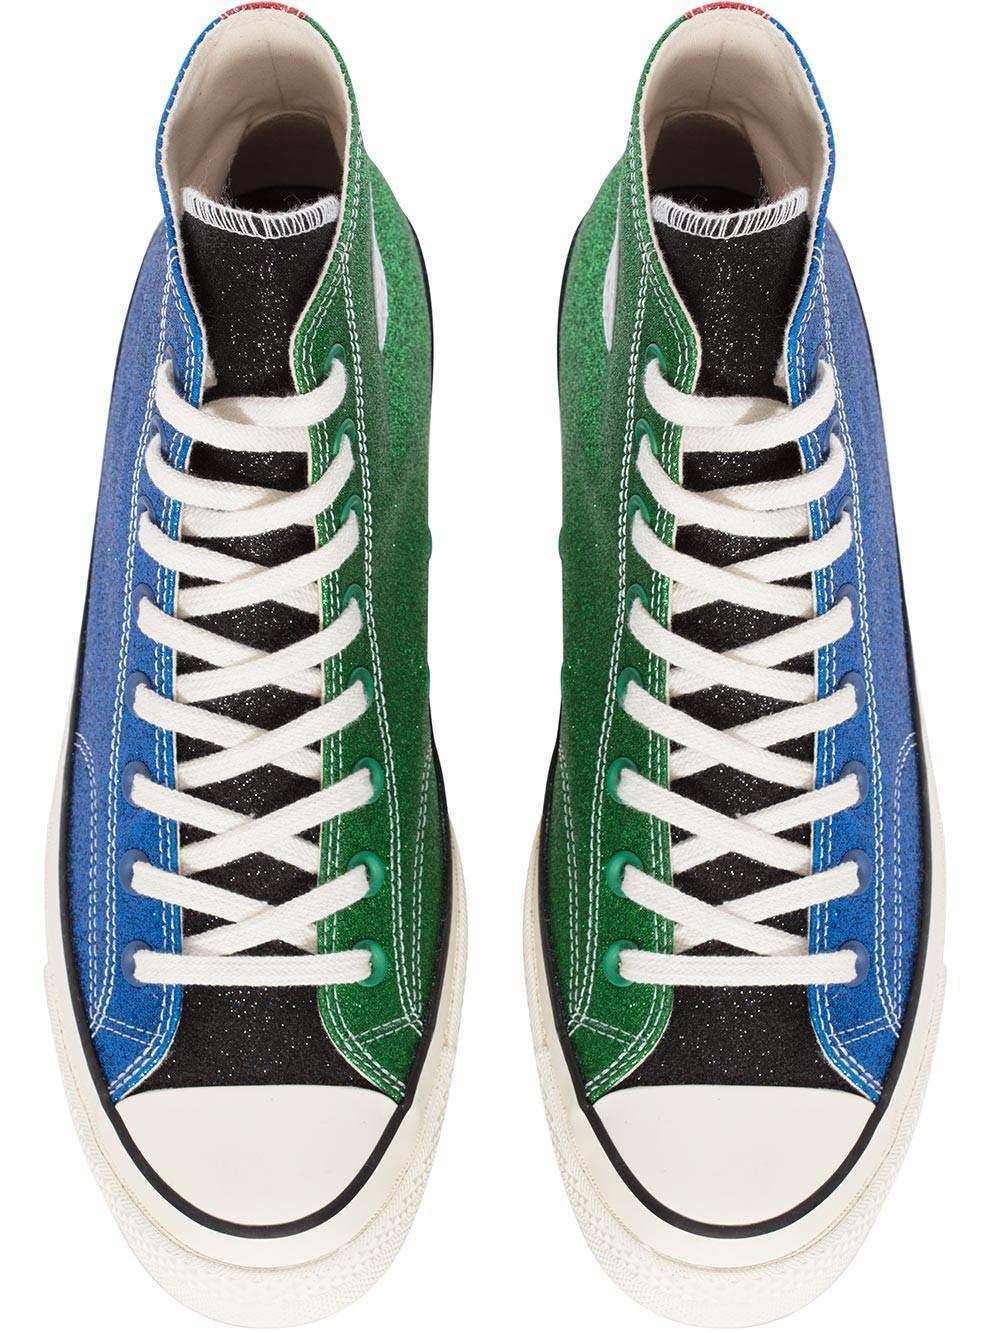 6c14fc436181 Lyst - JW Anderson Womens Blue   Green Glitter Chuck Taylor Converse ...